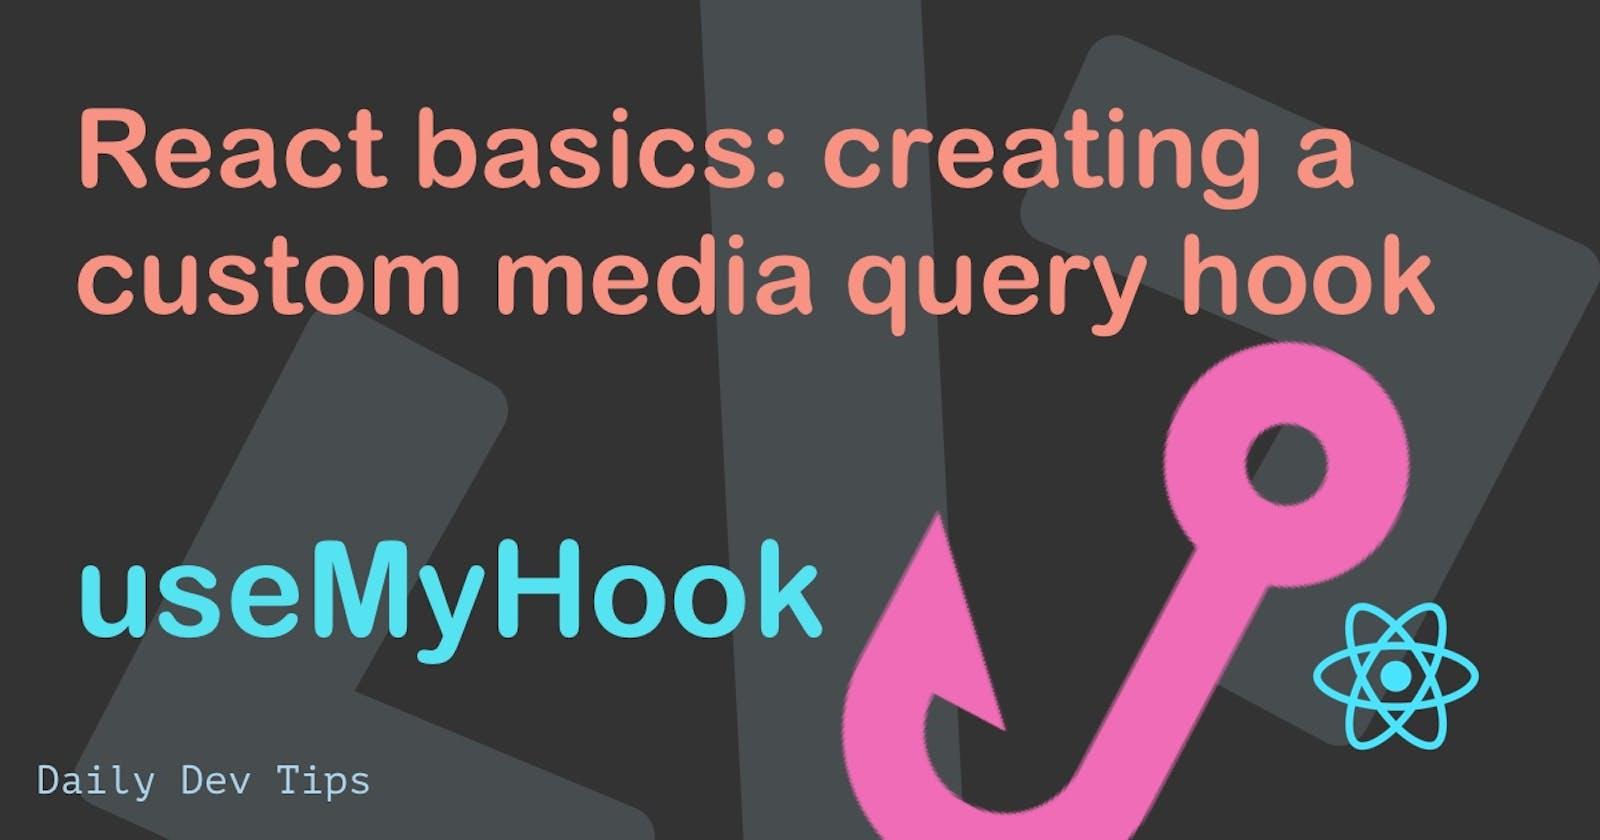 React basics: creating a custom media query hook